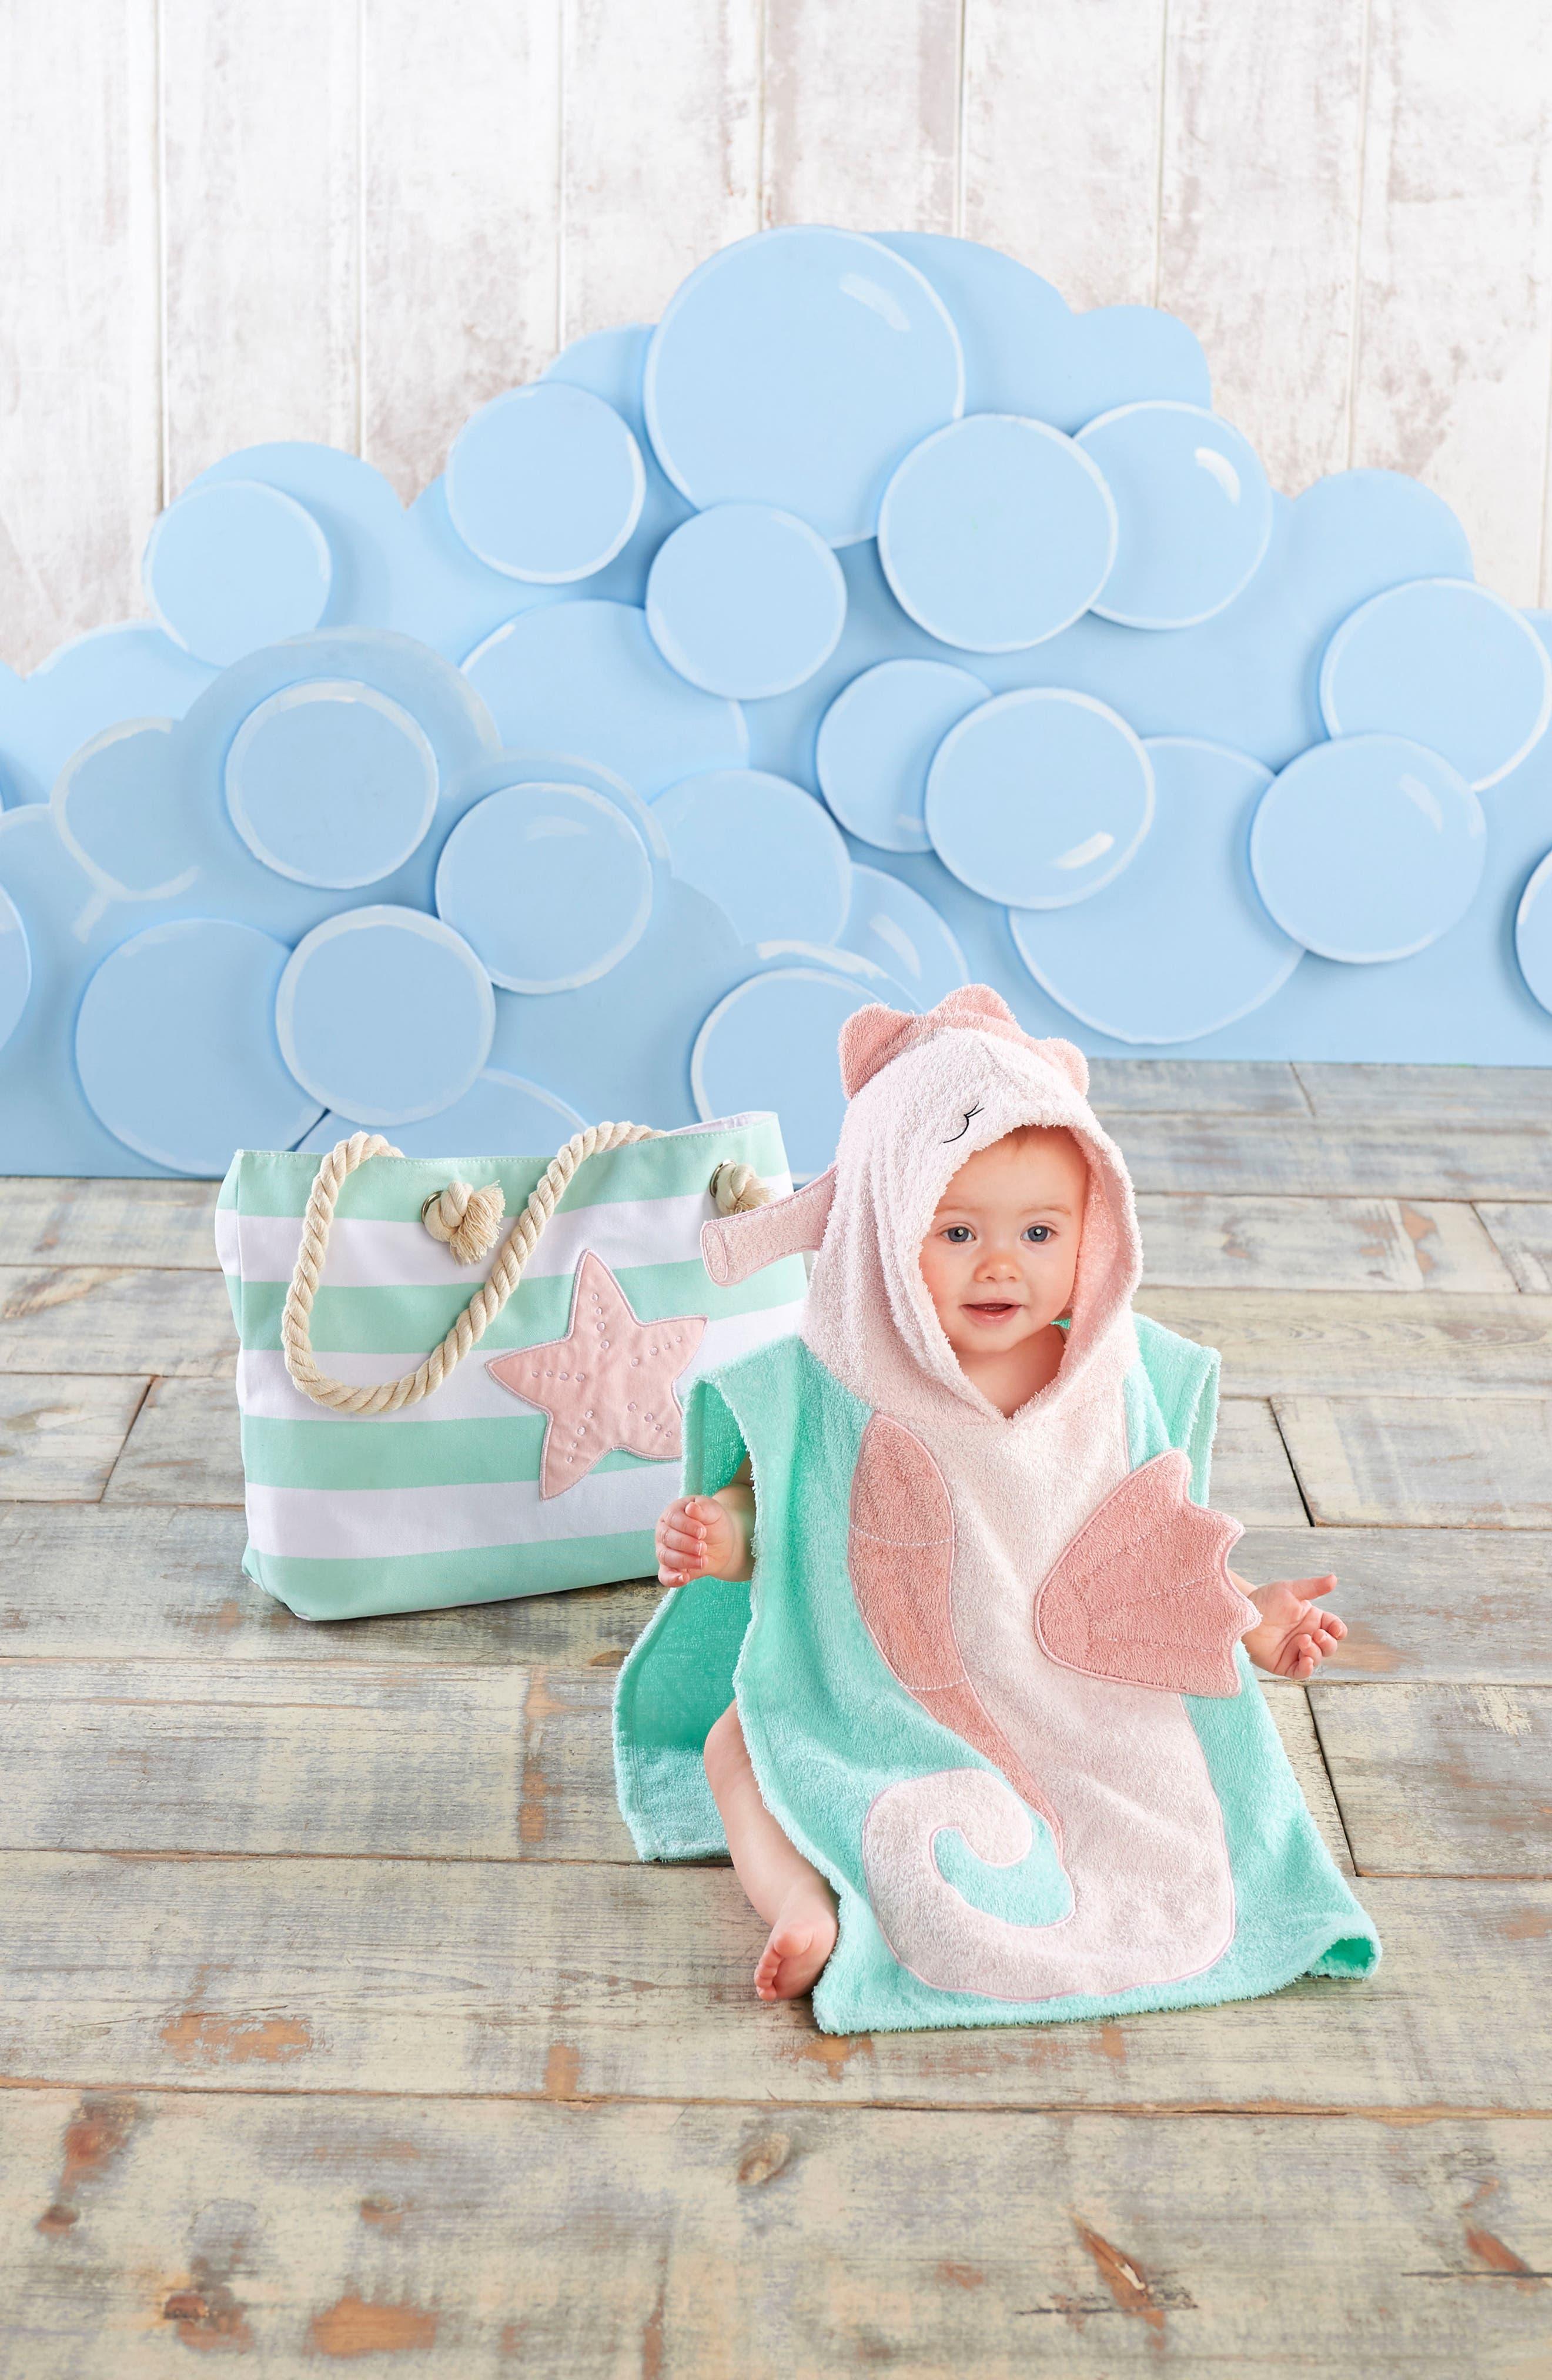 BABY ASPEN, Seahorse Hooded Towel, Swimsuit, Sun Hat & Tote Set, Alternate thumbnail 3, color, 690